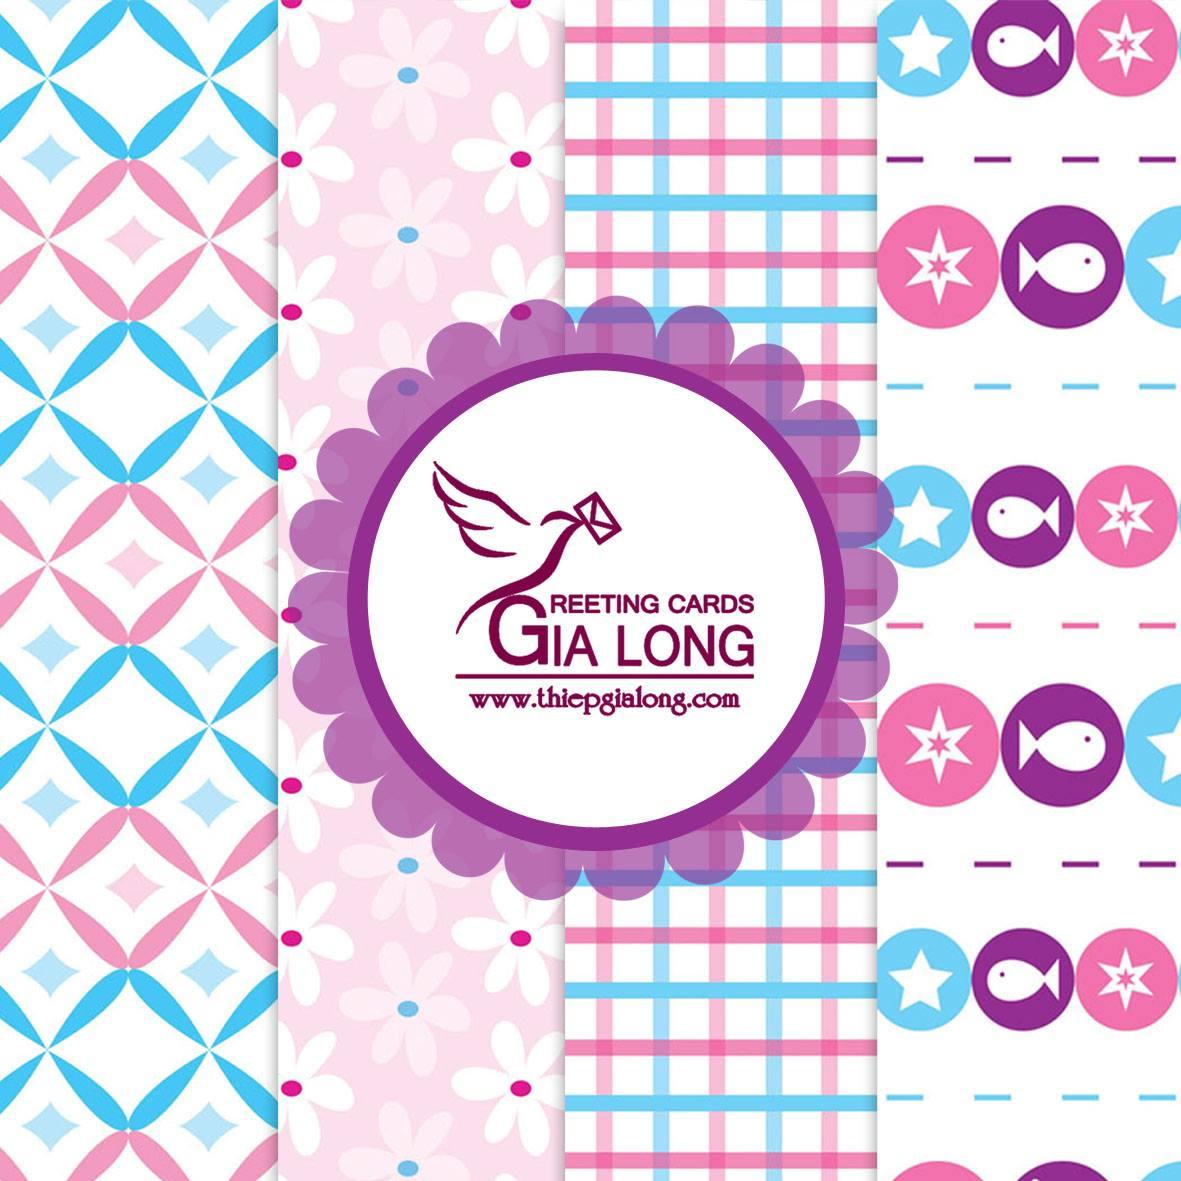 Gia Long Cards